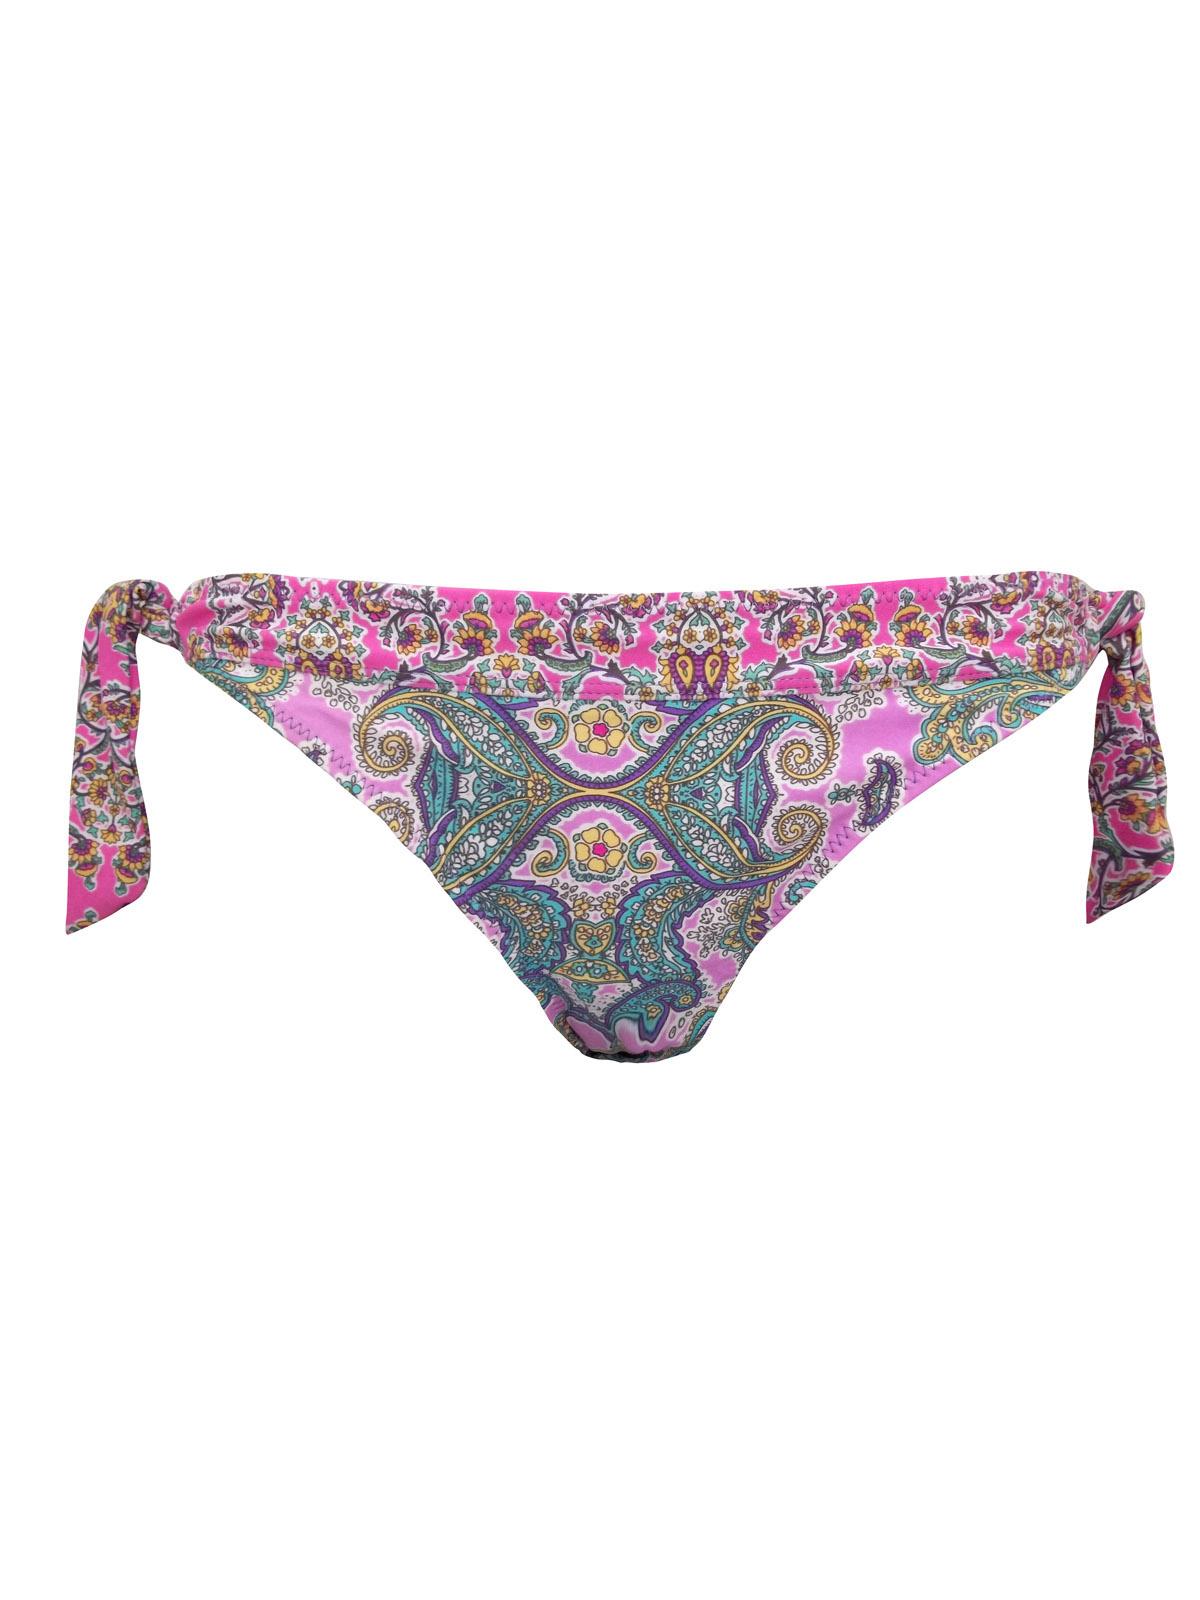 M0NS00N Accessor1ze PINK Paisley Print Tie Side Bikini Bottoms - Size 12 to 18